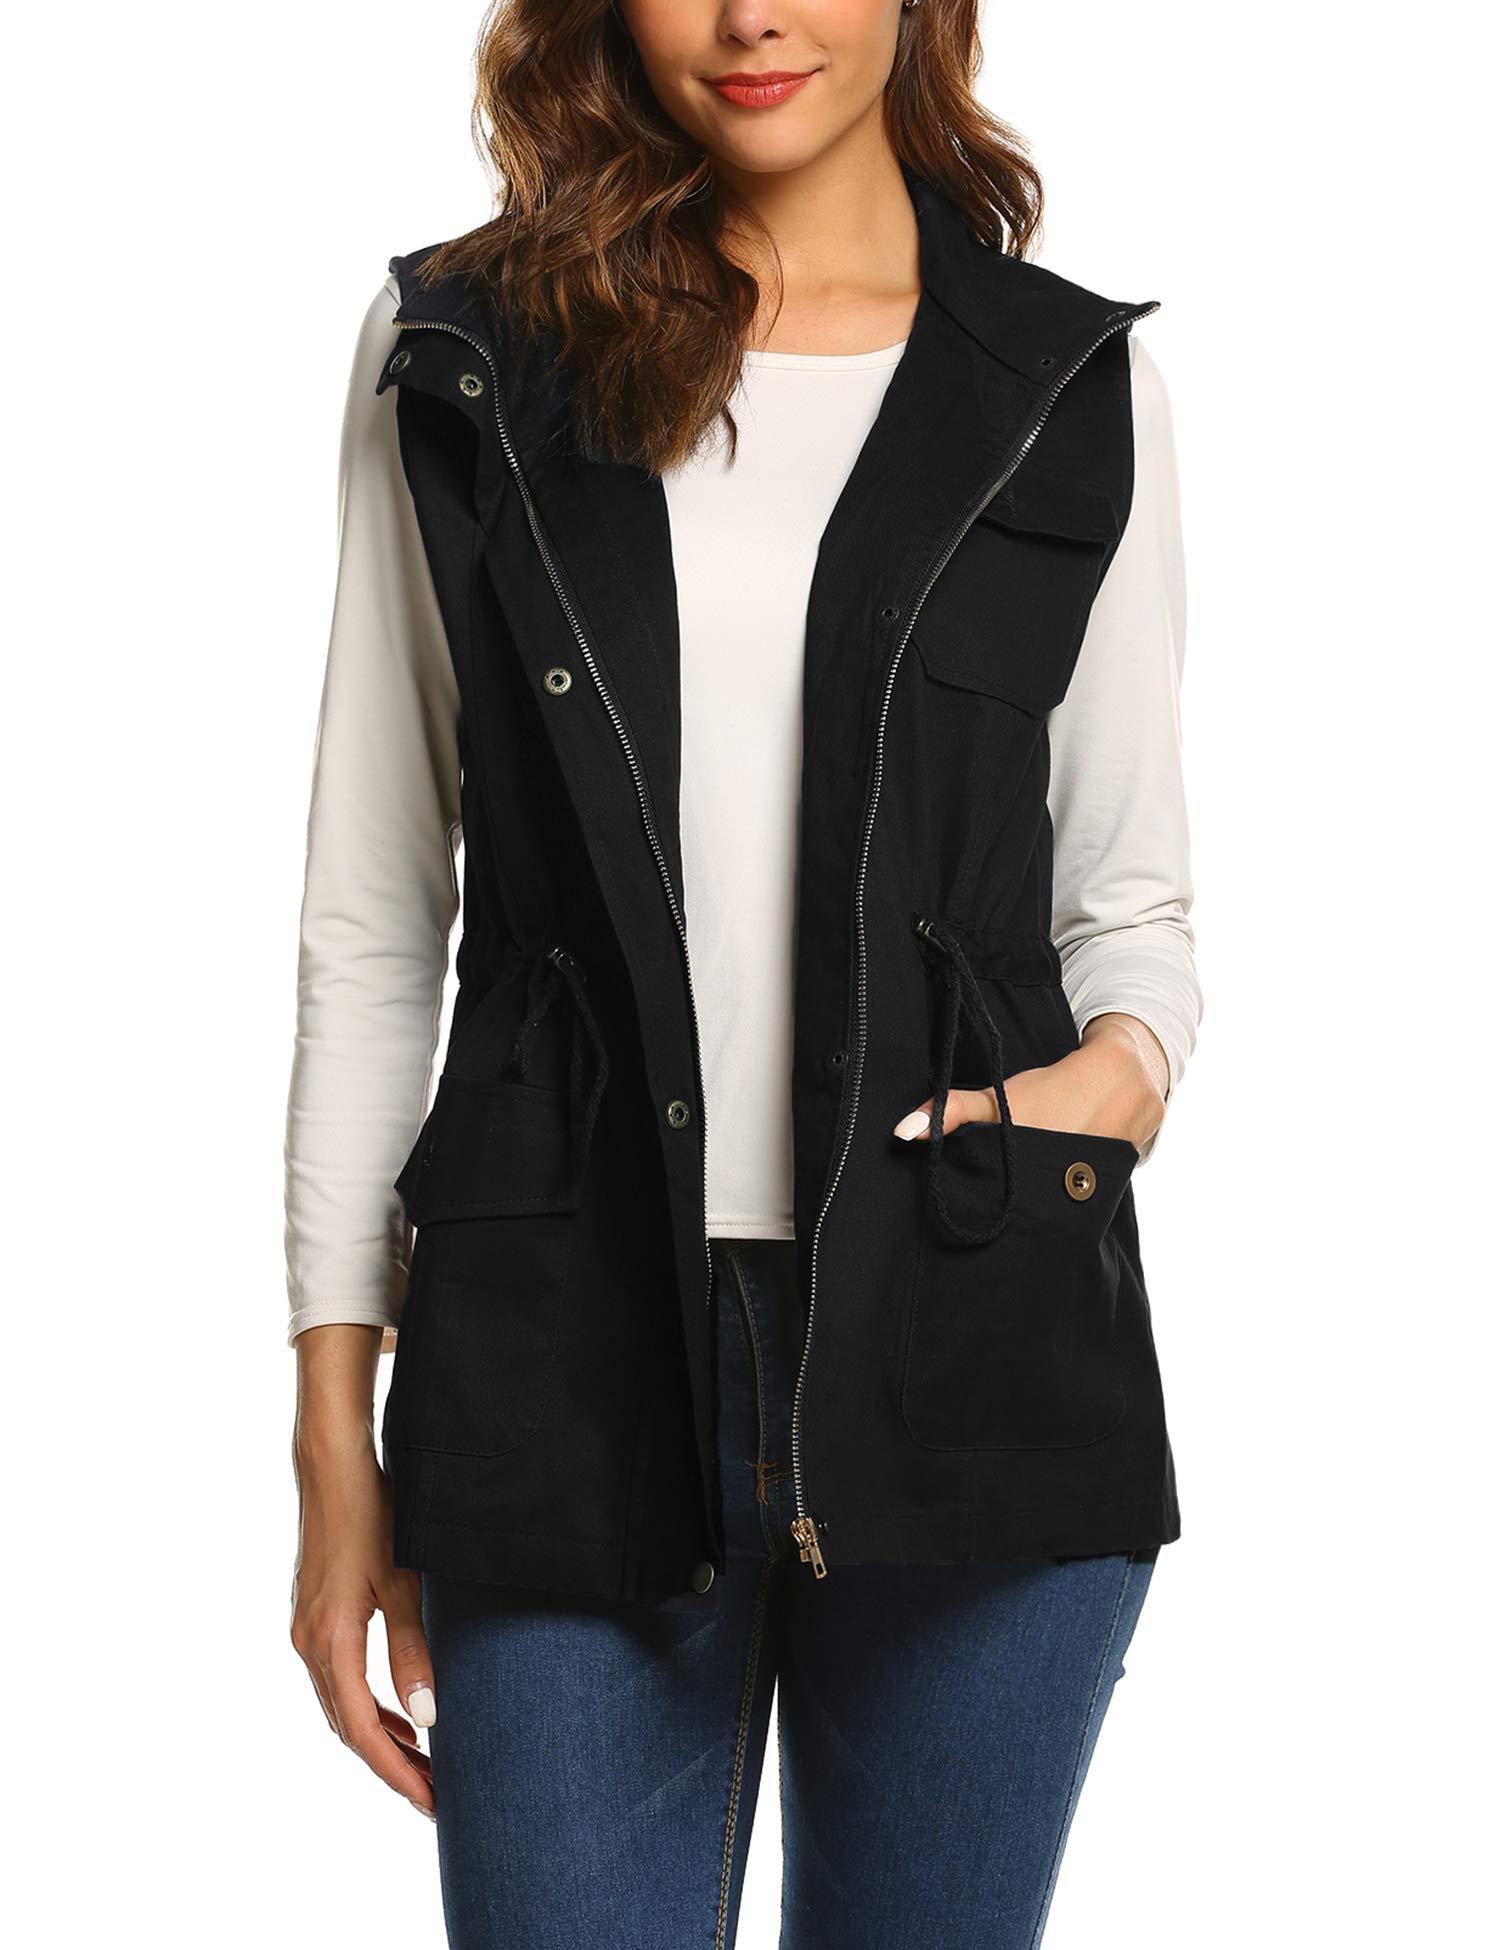 Beyove Womens Lightweight Sleeveless Utility Military Anorak Cotton Vest by Beyove